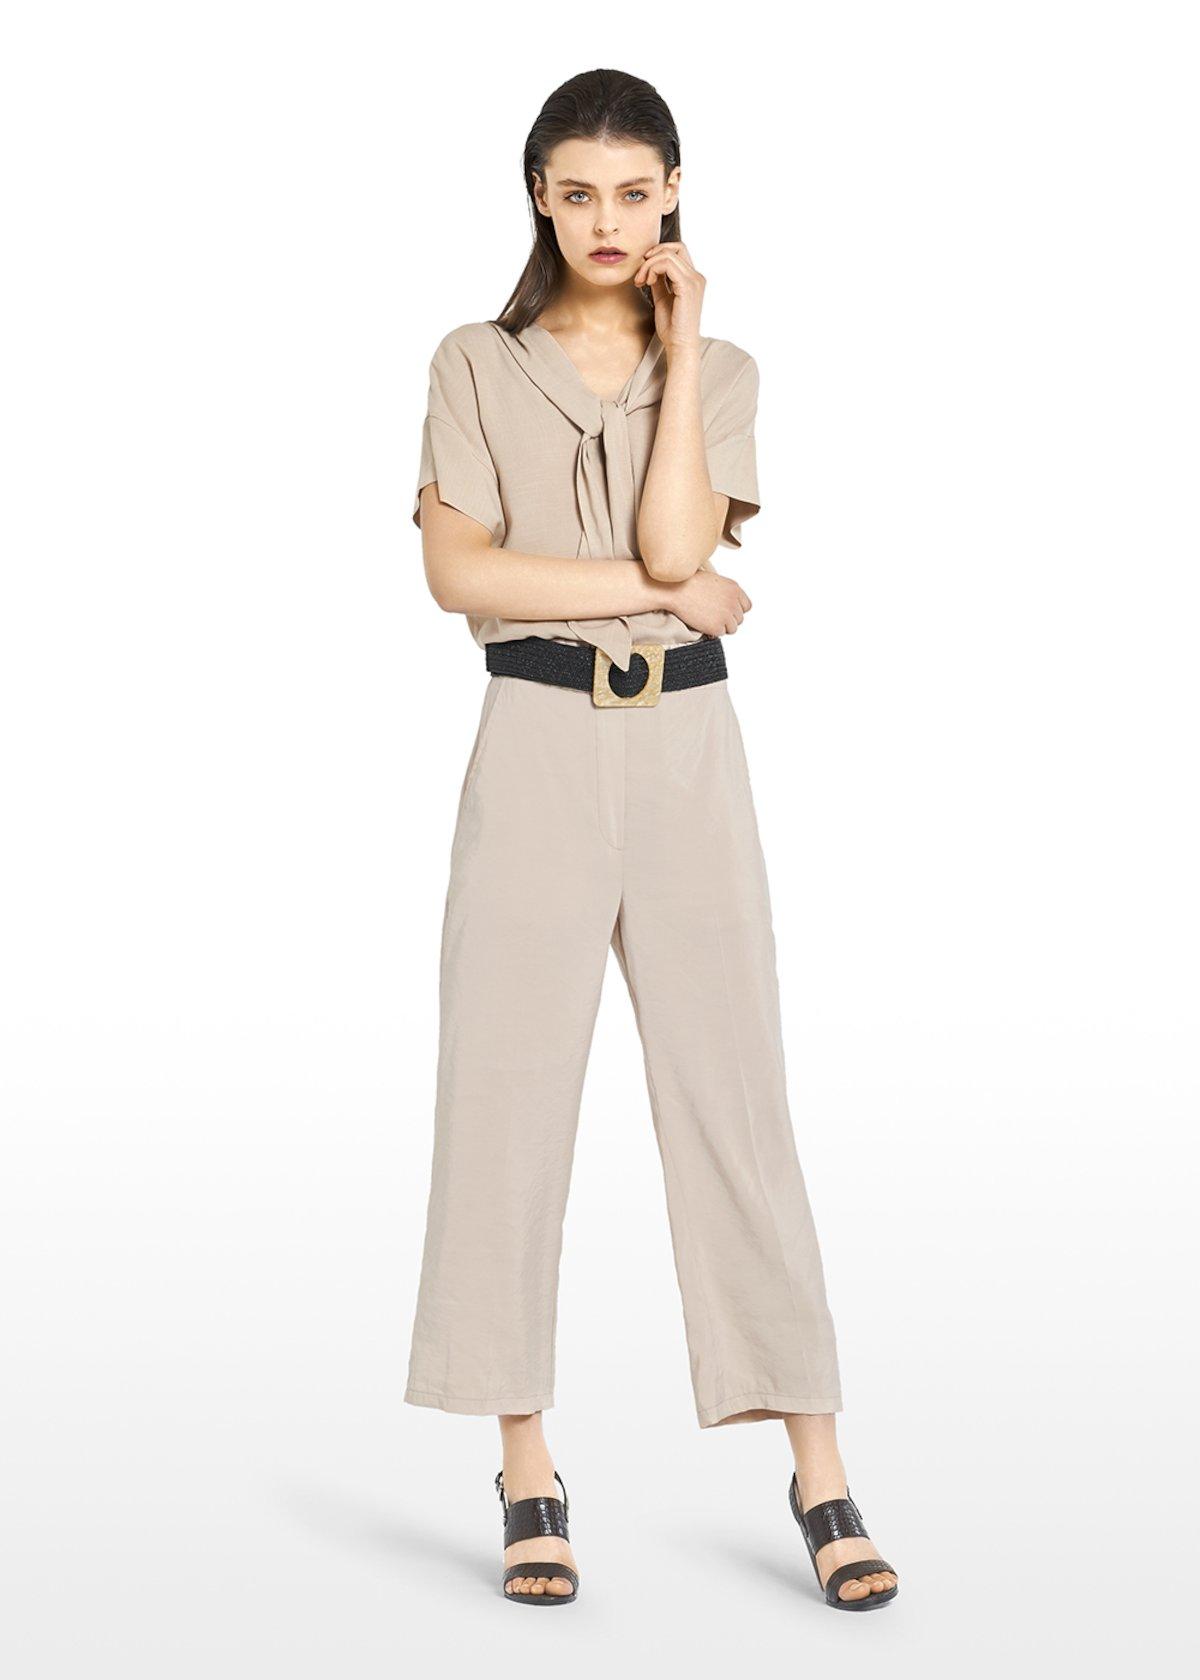 Stella short-sleeved T-shirt with scarf neckline detail - Light Beige - Woman